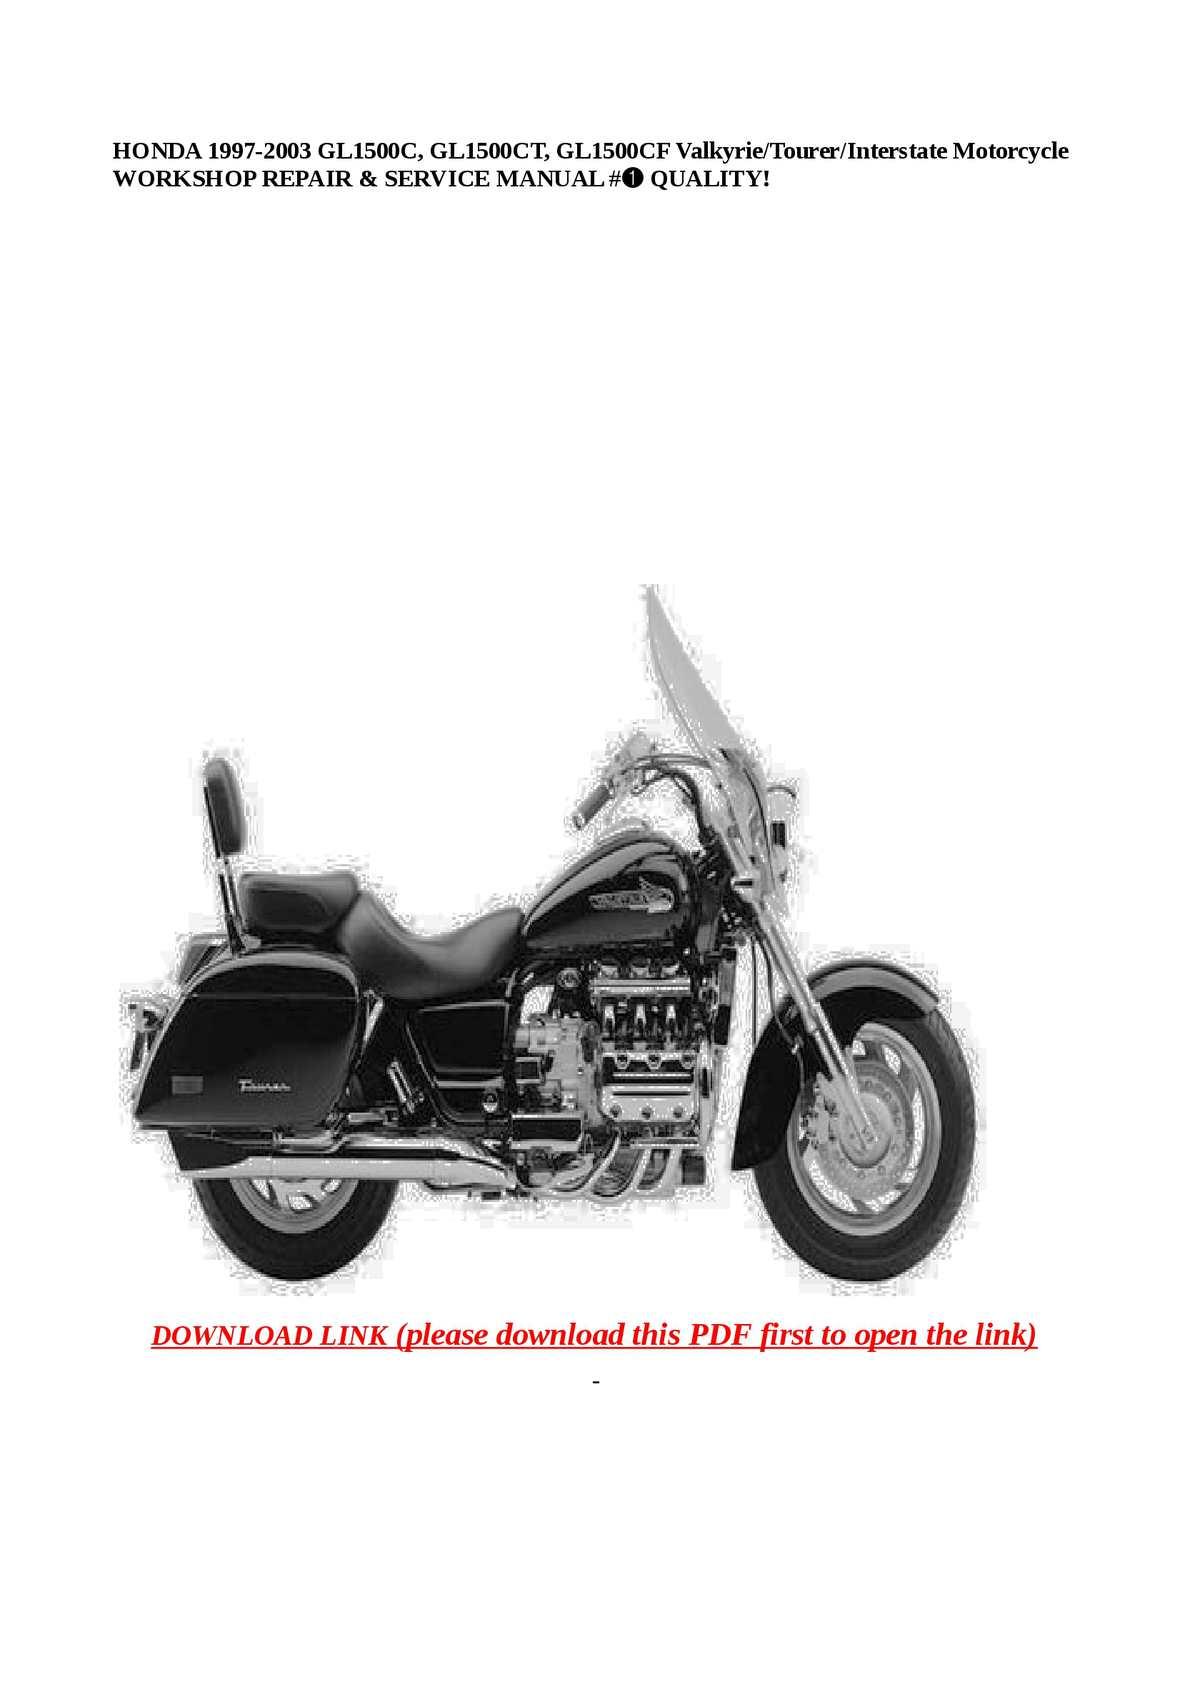 Calaméo - HONDA 1997-2003 GL1500C, GL1500CT, GL1500CF Valkyrie/Tourer/Interstate  Motorcycle WORKSHOP REPAIR & SERVICE MANUAL #➀ QUALITY!